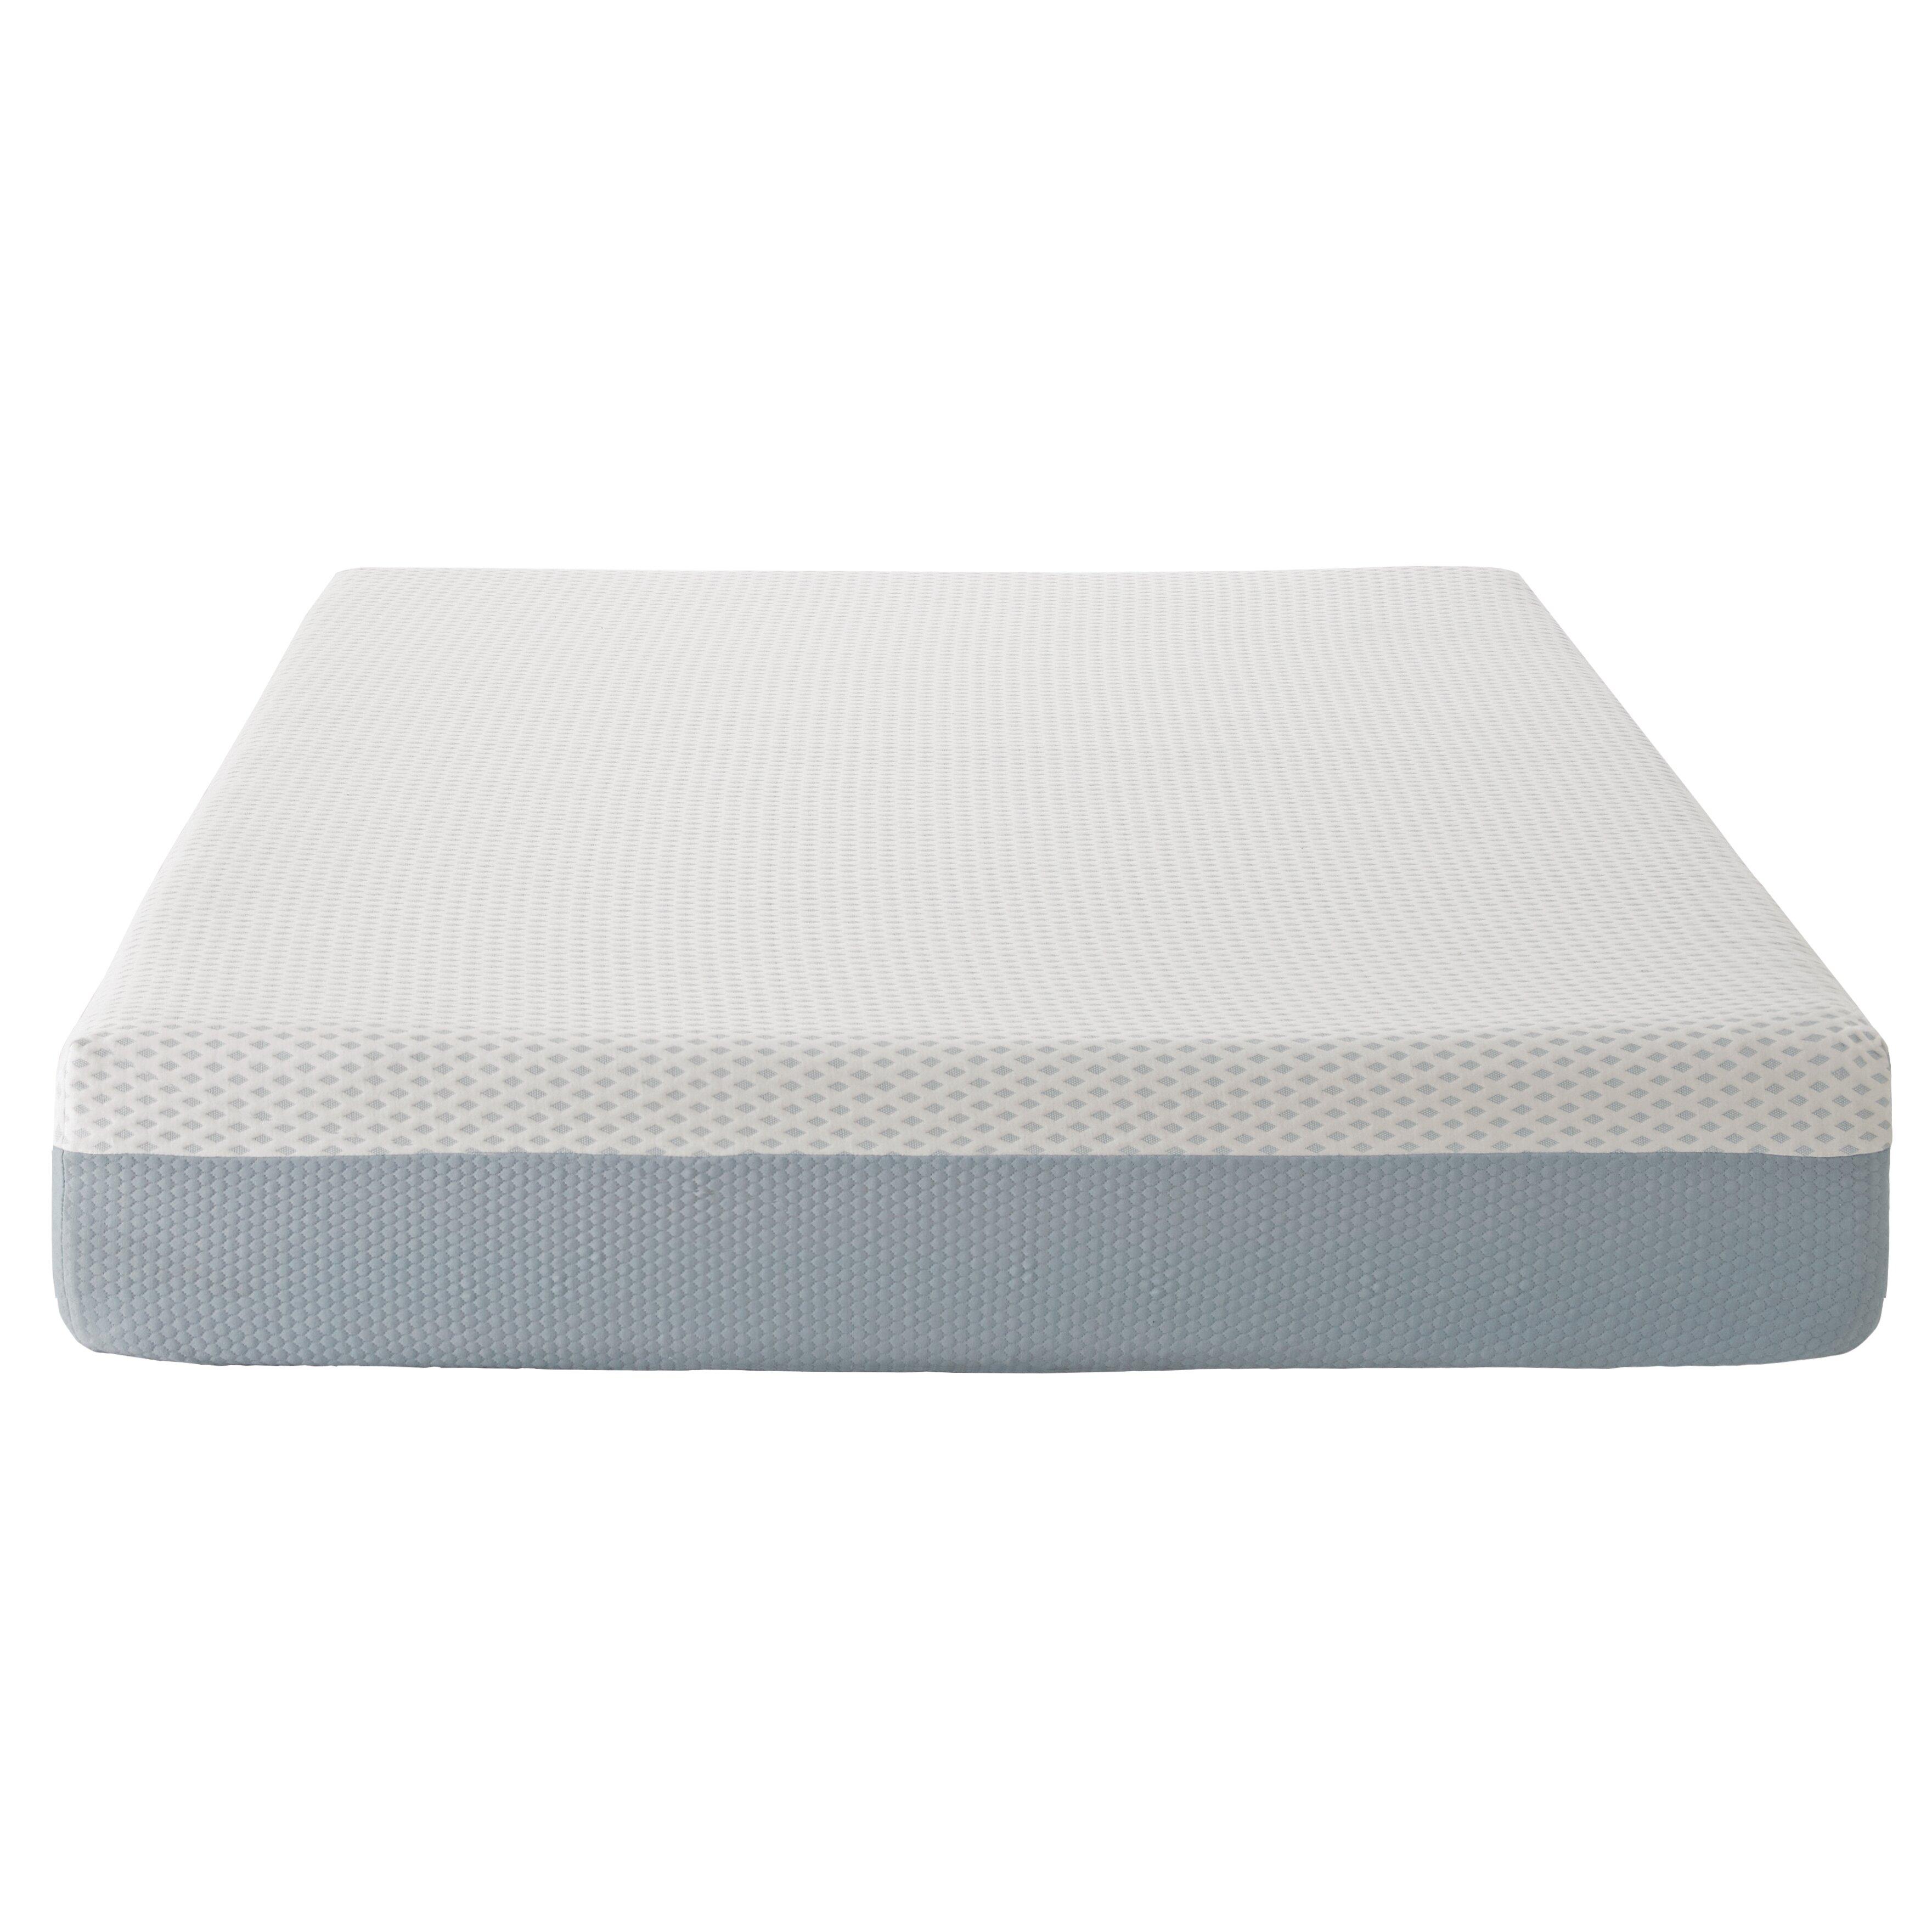 Eco Lux 11 Latex Foam Mattress Reviews Wayfair